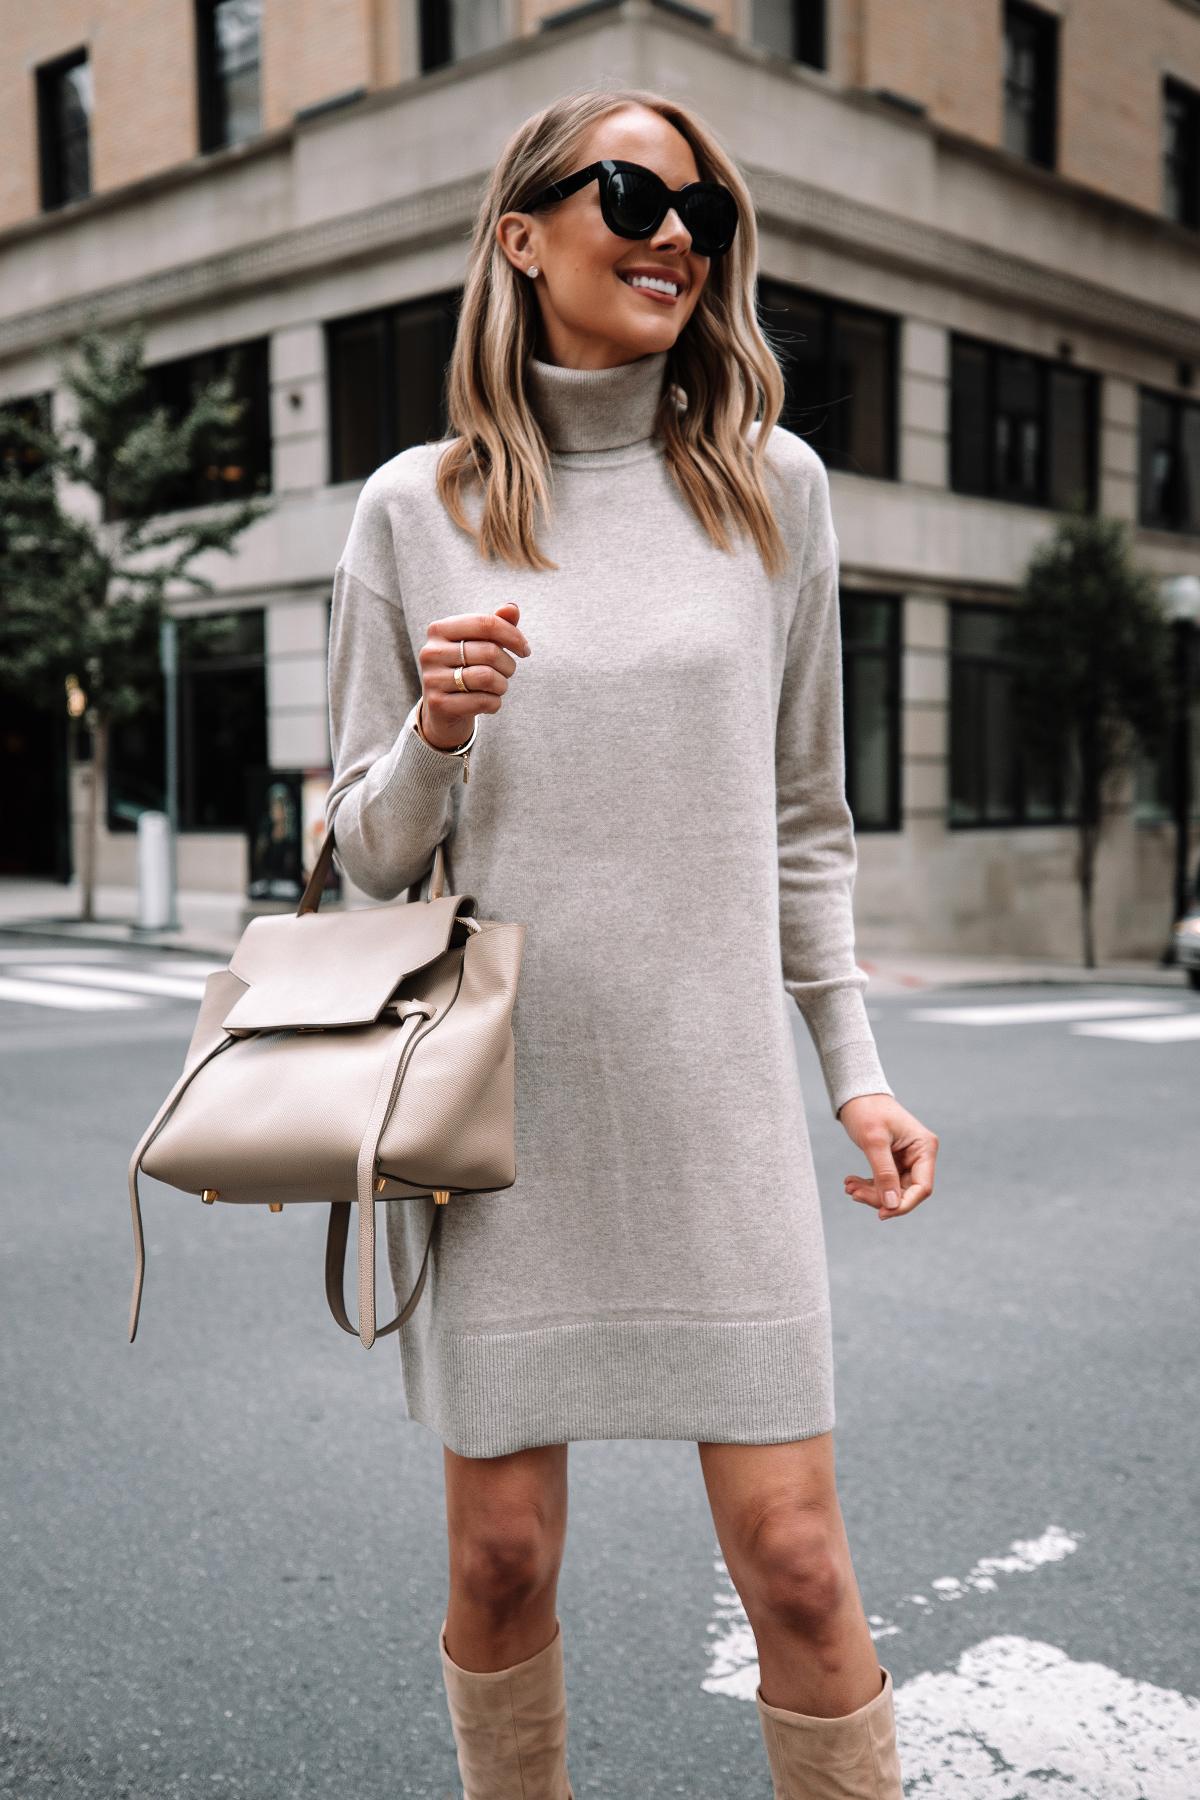 Fashion Jackson Wearing Everlane Beige Turtleneck Sweater Dress Tan Knee High Boots 1